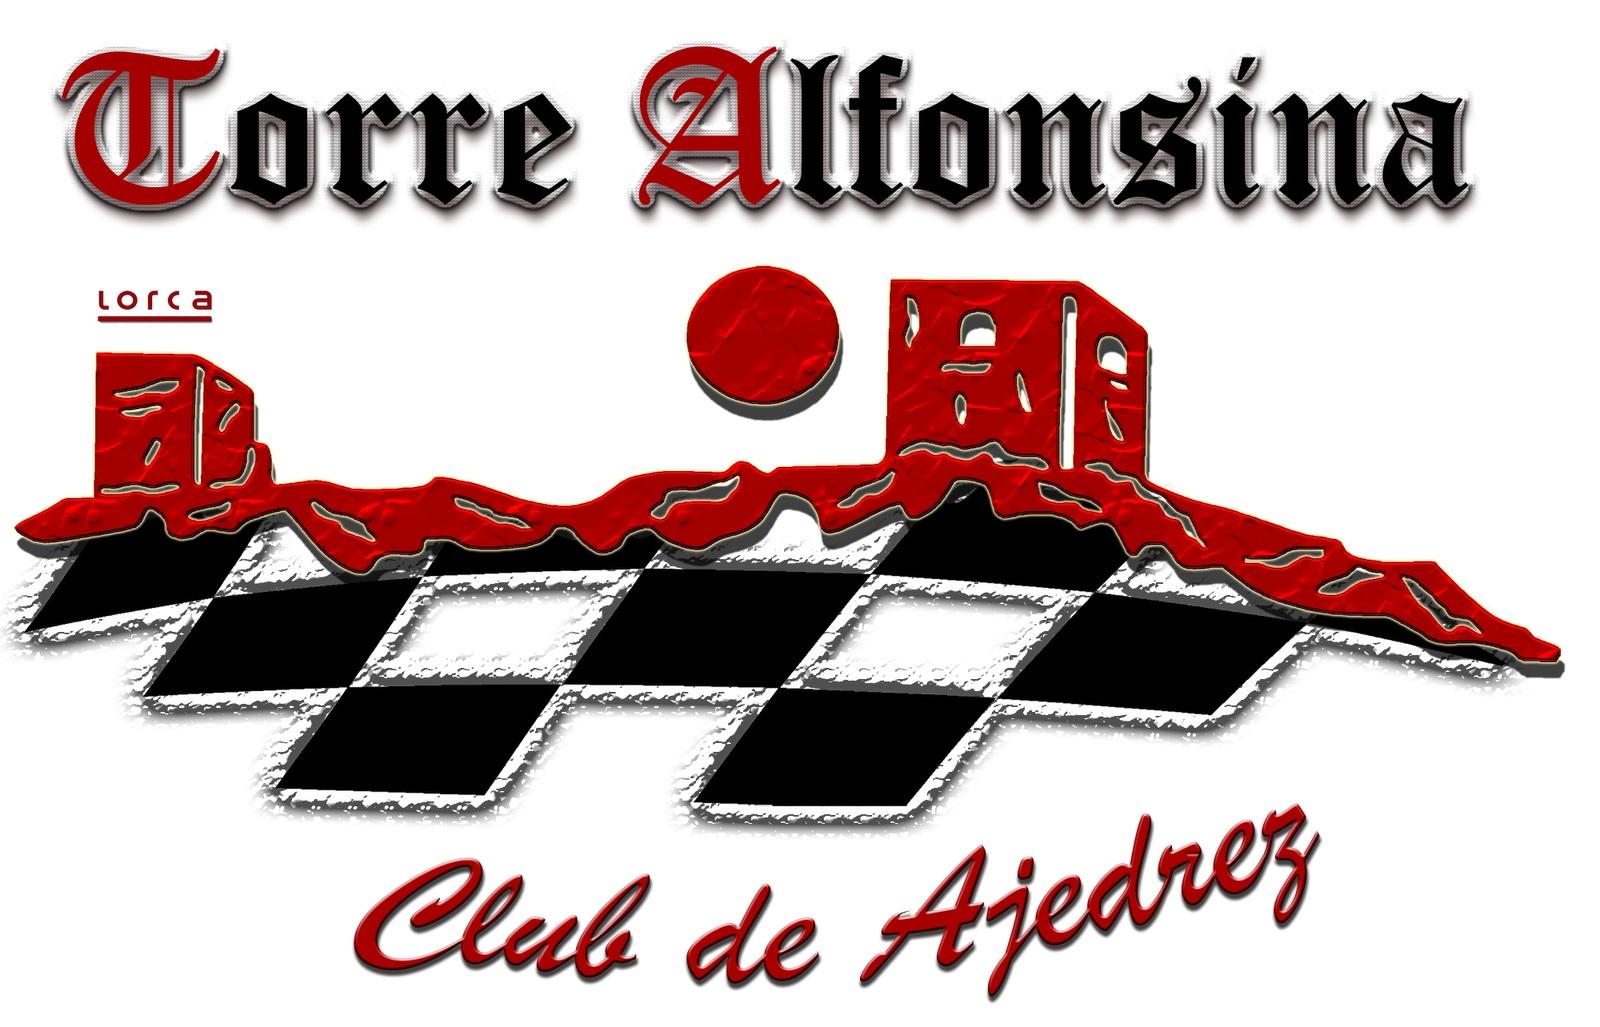 Club de Ajedrez Torre Alfonsina